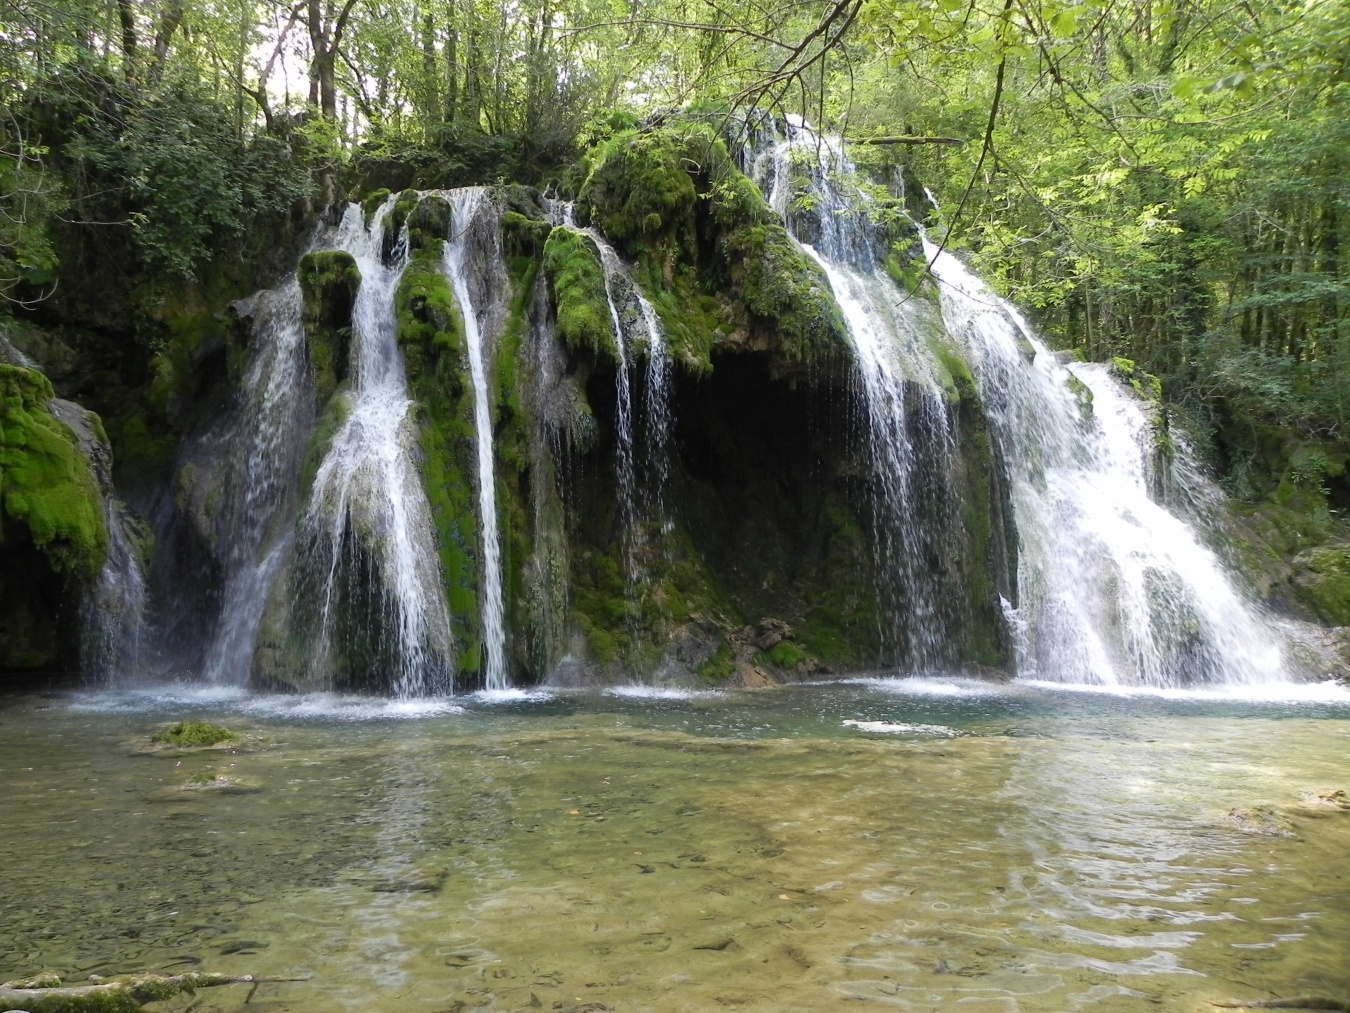 la cascade du Tuf à Mesnay